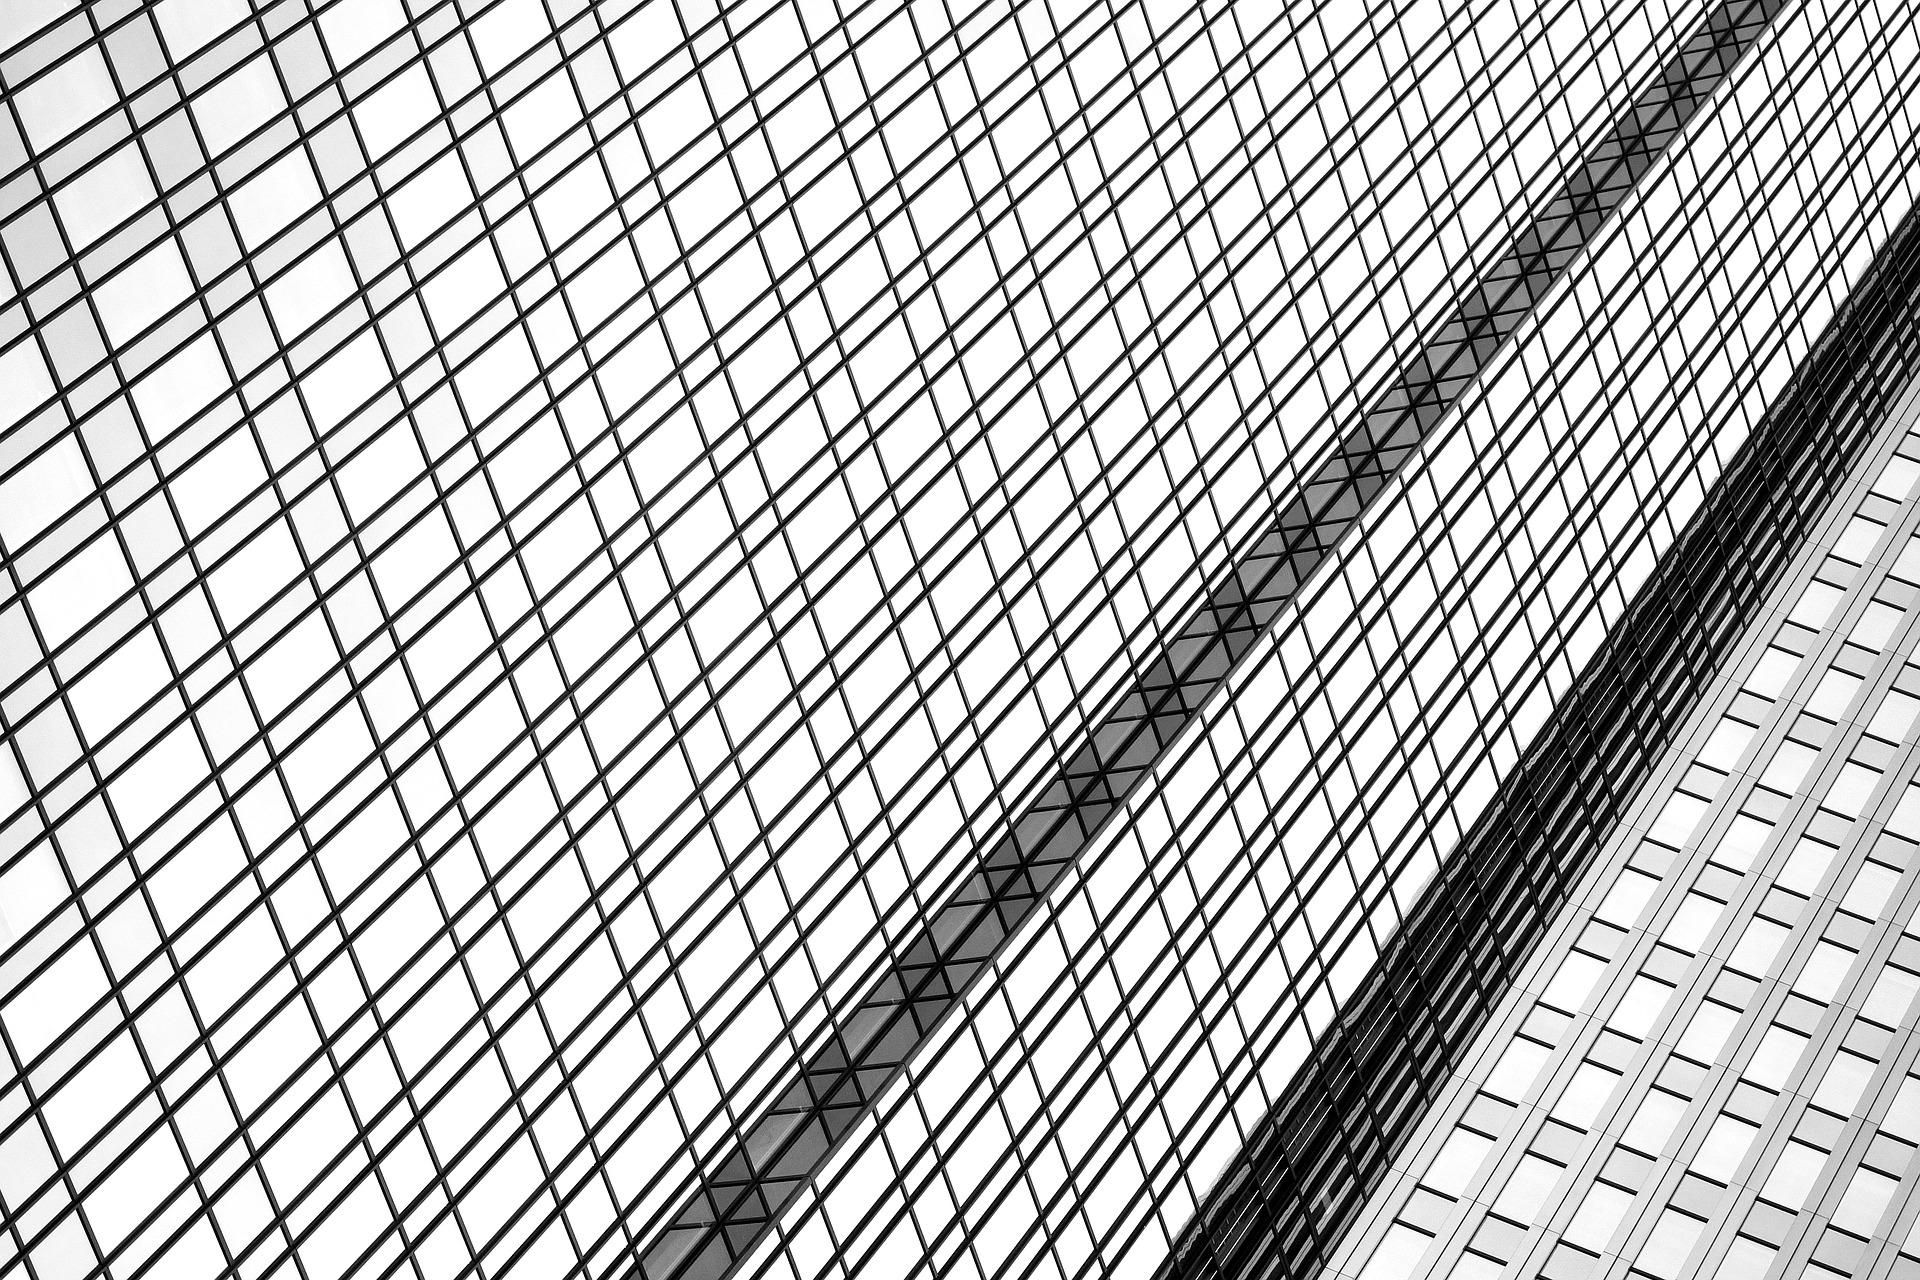 skyscraper-2203337_1920.jpg